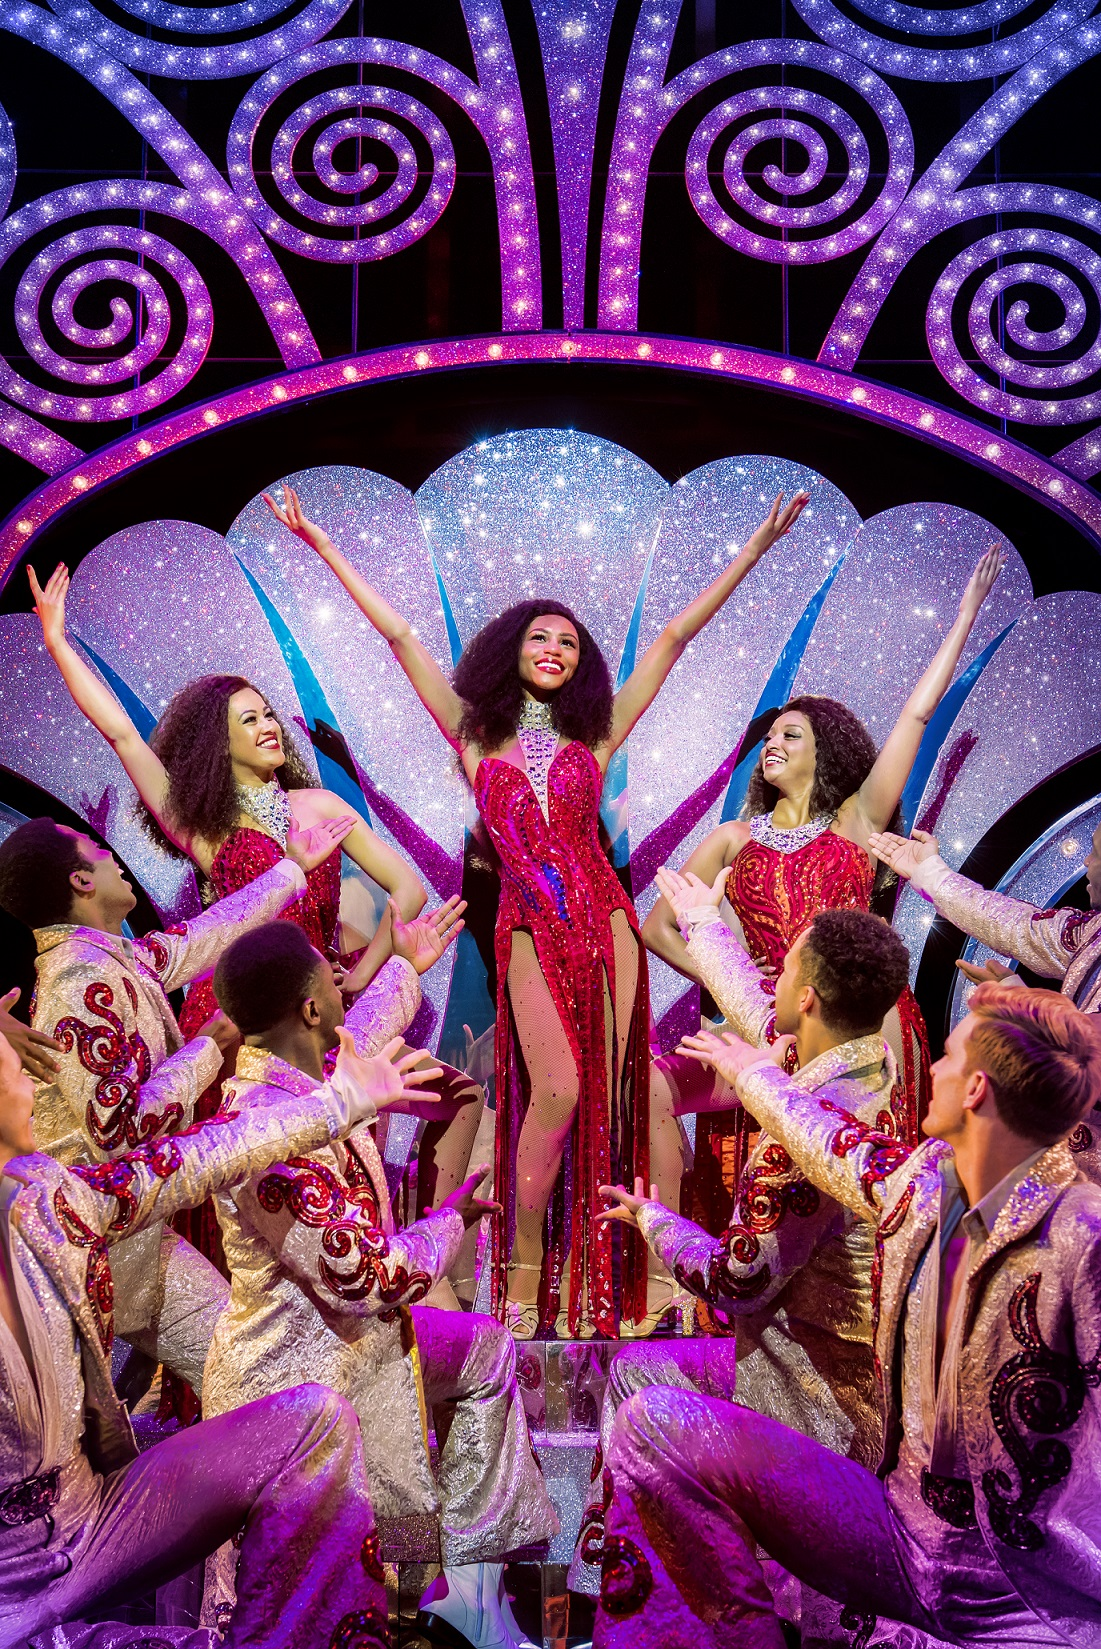 Kimmy-Edwards-Brennyn-Lark-Asmeret-Ghebremichael-and-company-in-Dreamgirls-at-the-Savoy-Theatre.-Credit-Dewynters.jpg